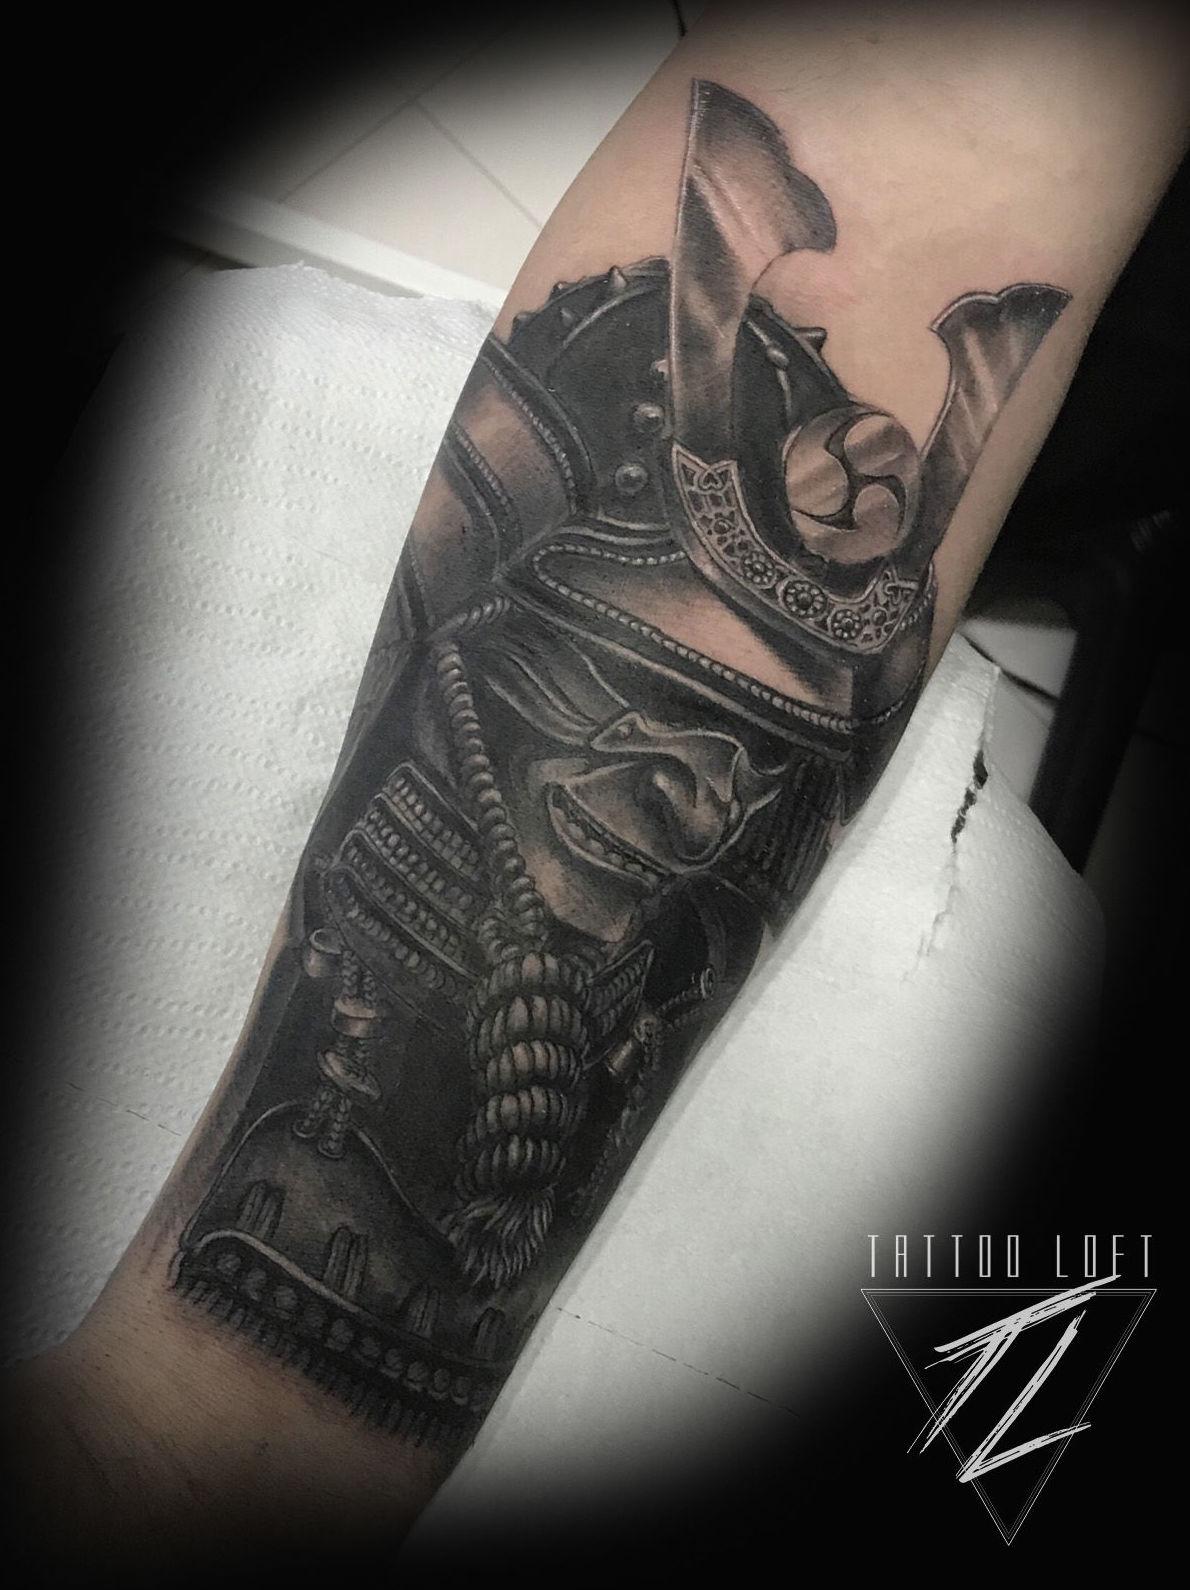 Foto 10 de Estudio artístico de tatuaje en  | Tattoo Loft